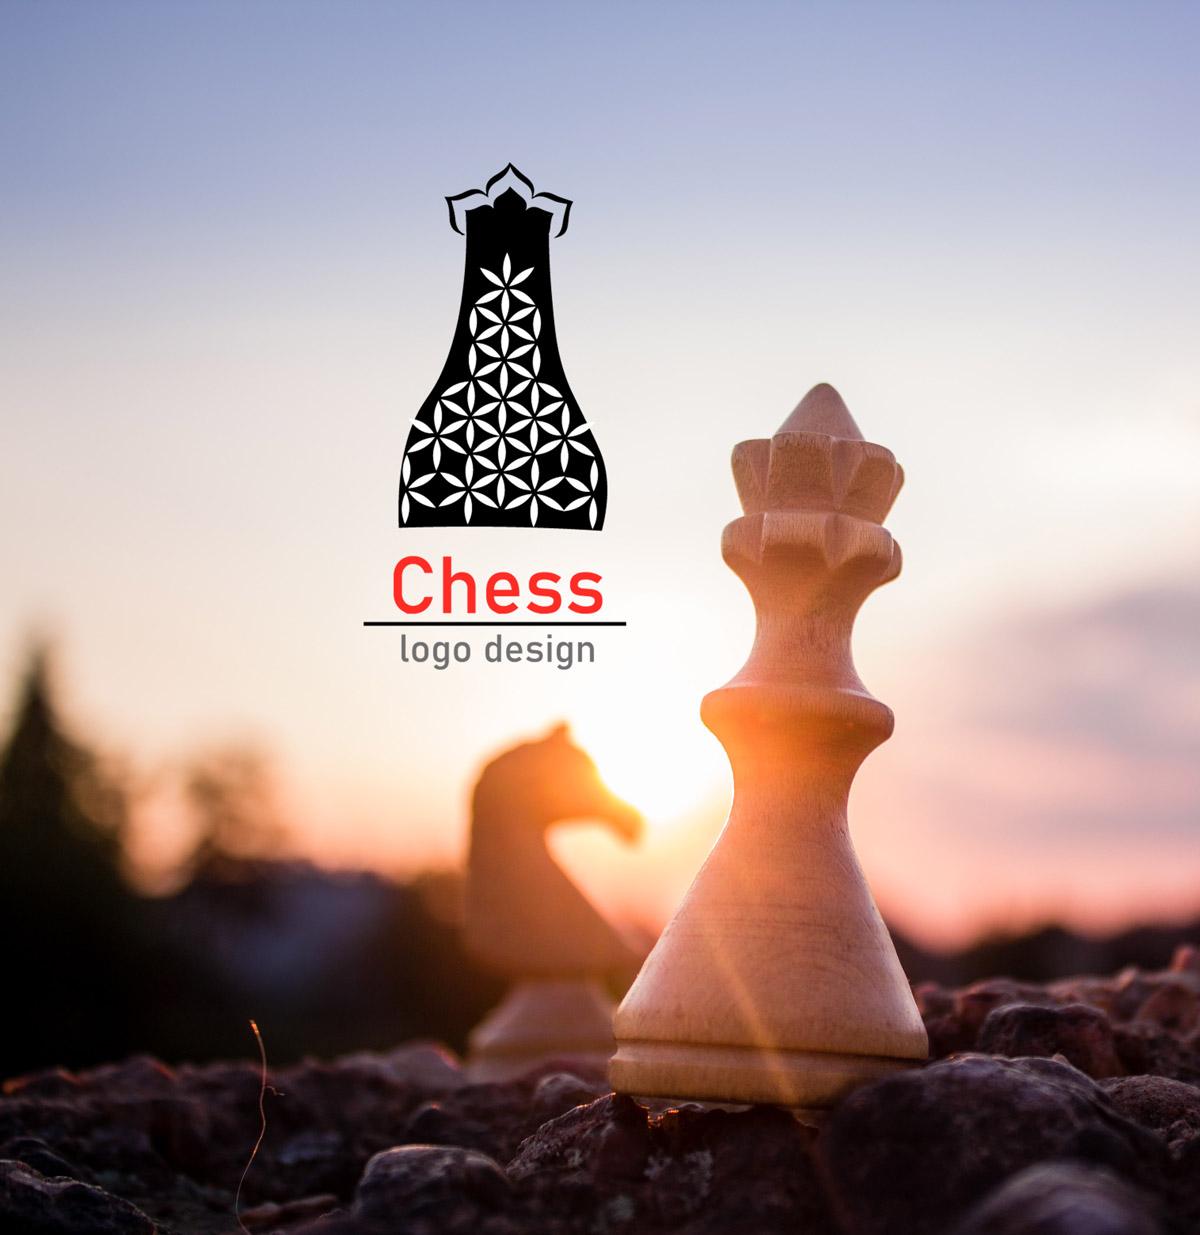 chess-logo-design-brand-identity-mockup-ayatemplates